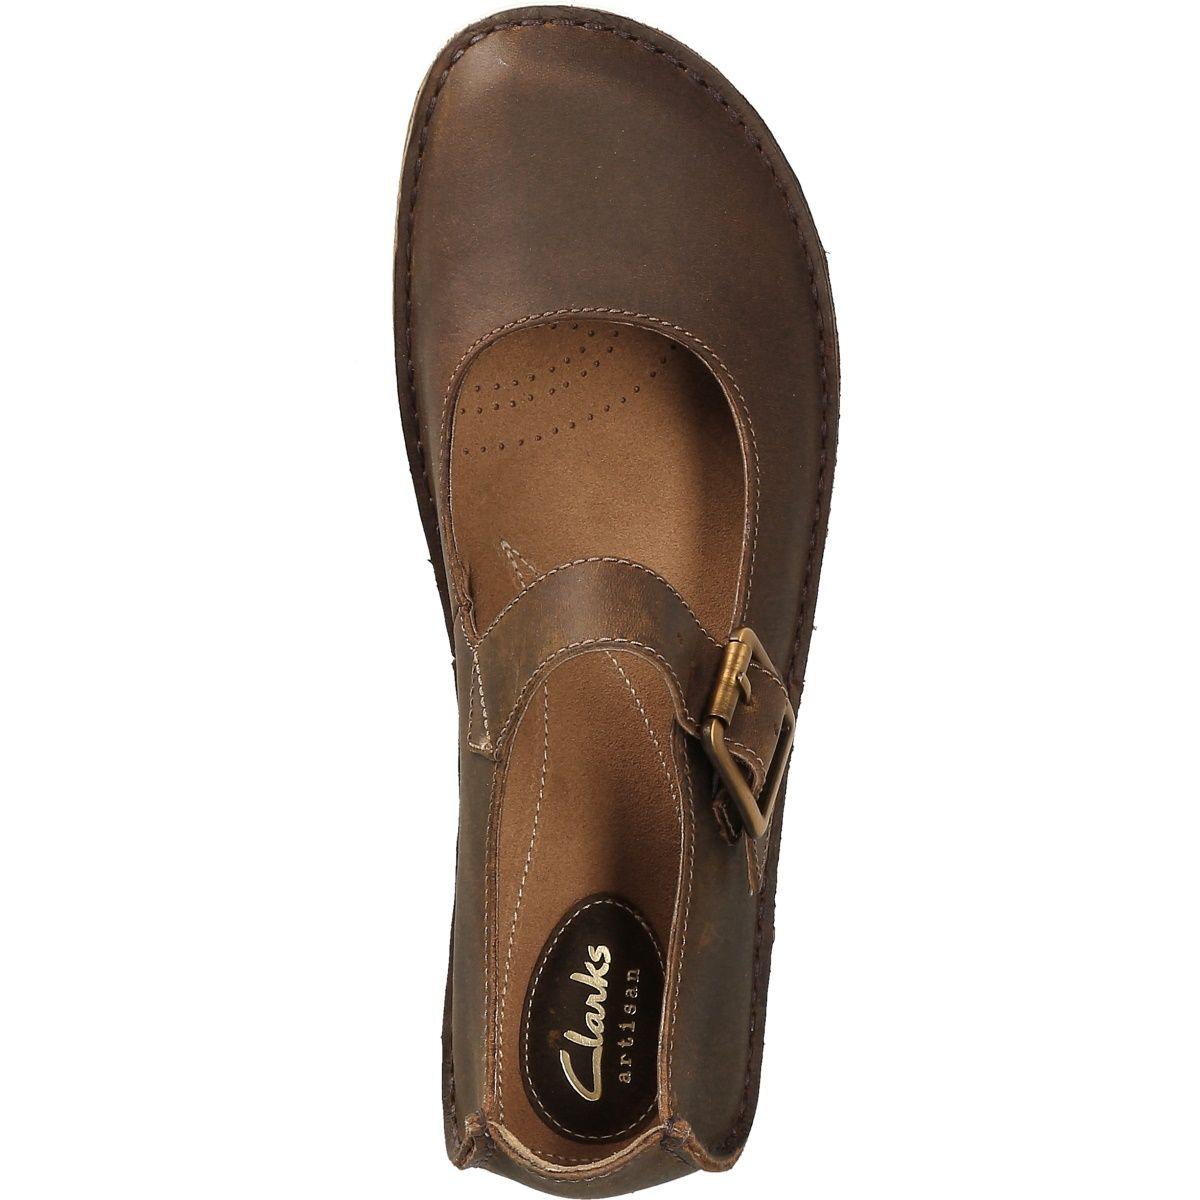 Clarks Janey June 26113313 4 Damenschuhe Ballerina im Schuhe